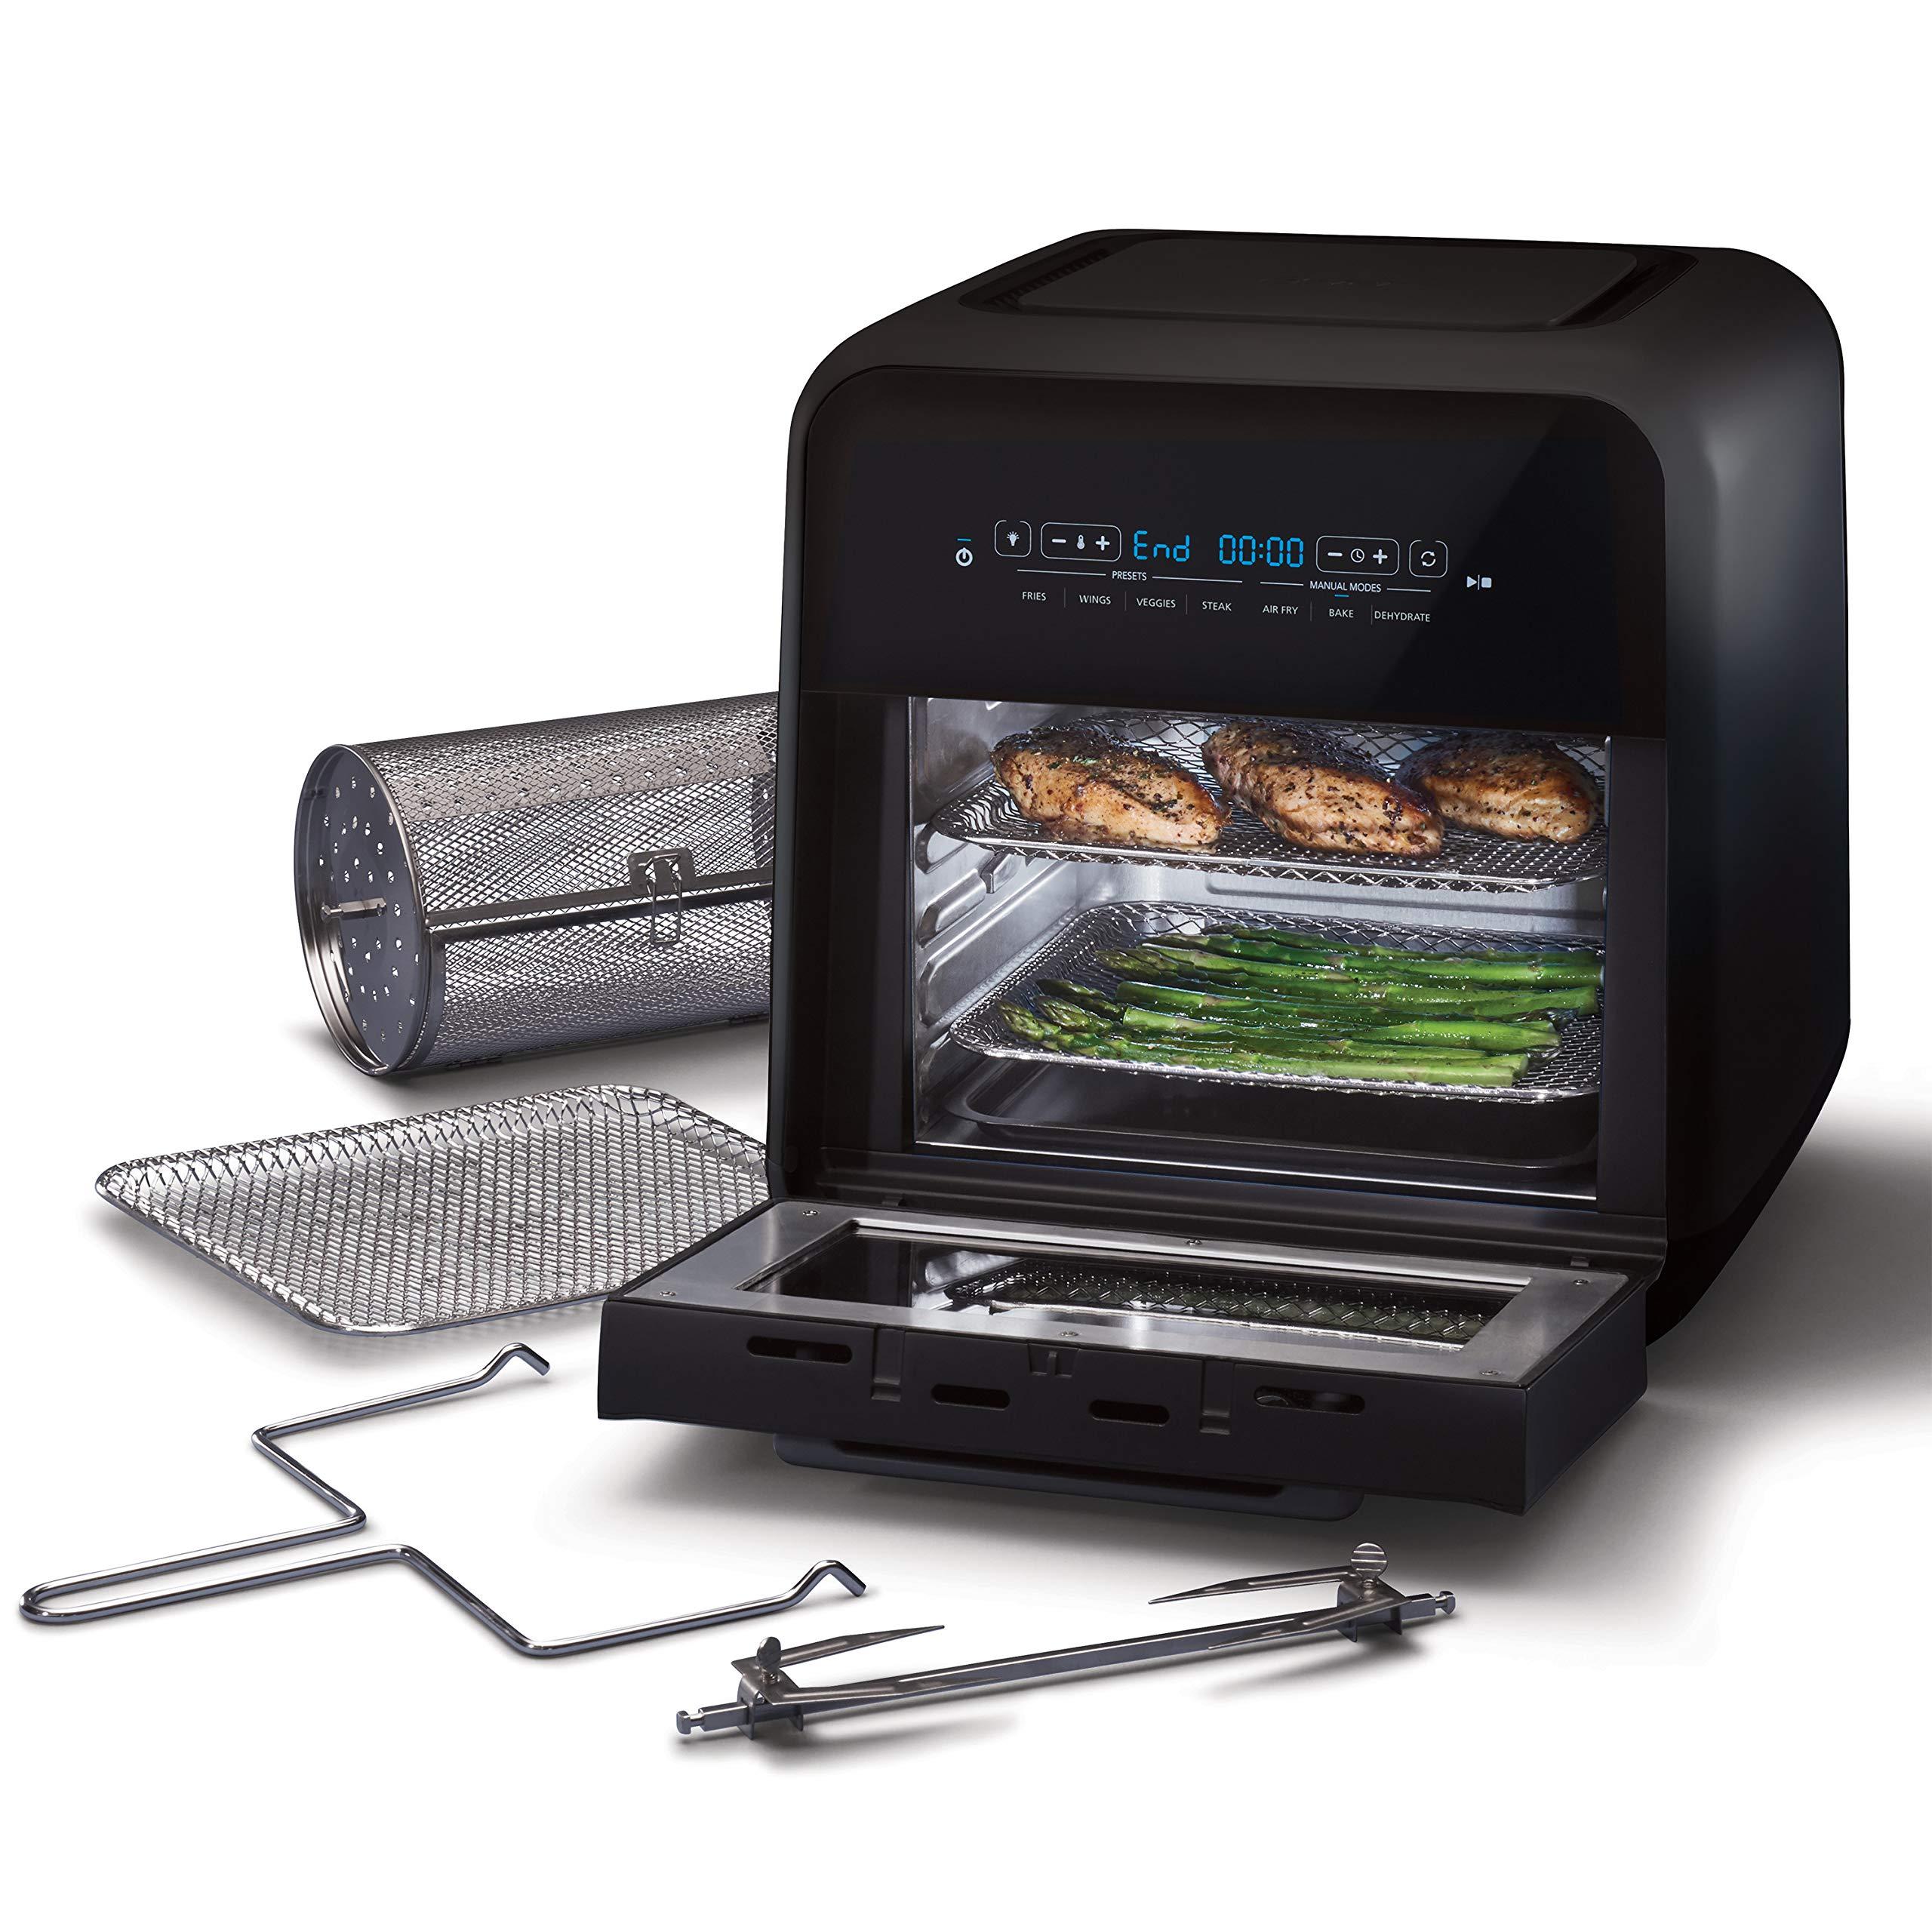 Oster 2086062 Fryer Multi Cooker Black